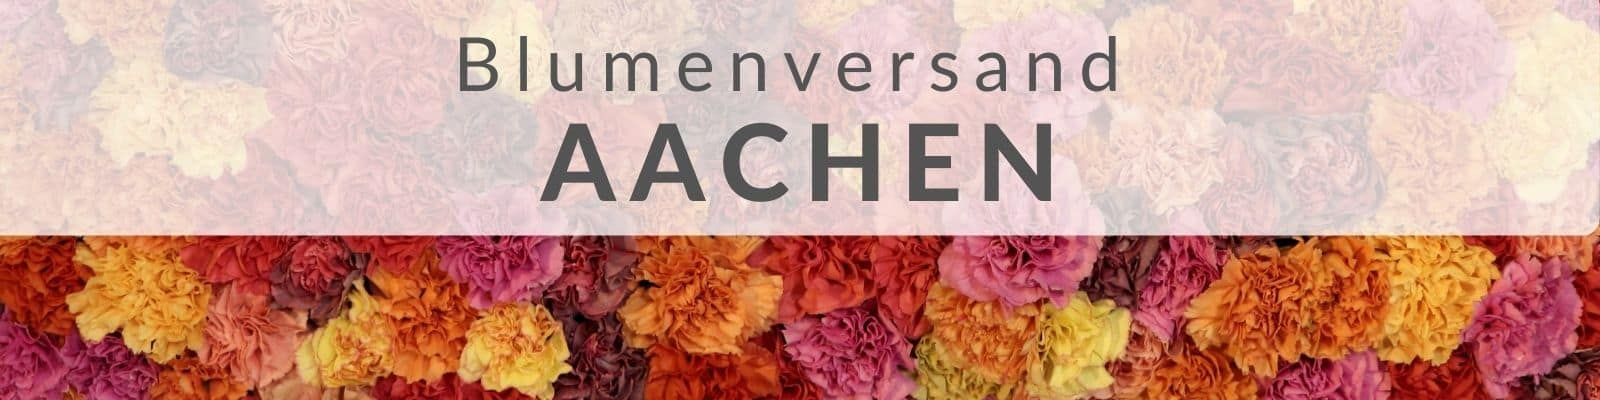 Blumen verschicken Aachen - Blumenversand